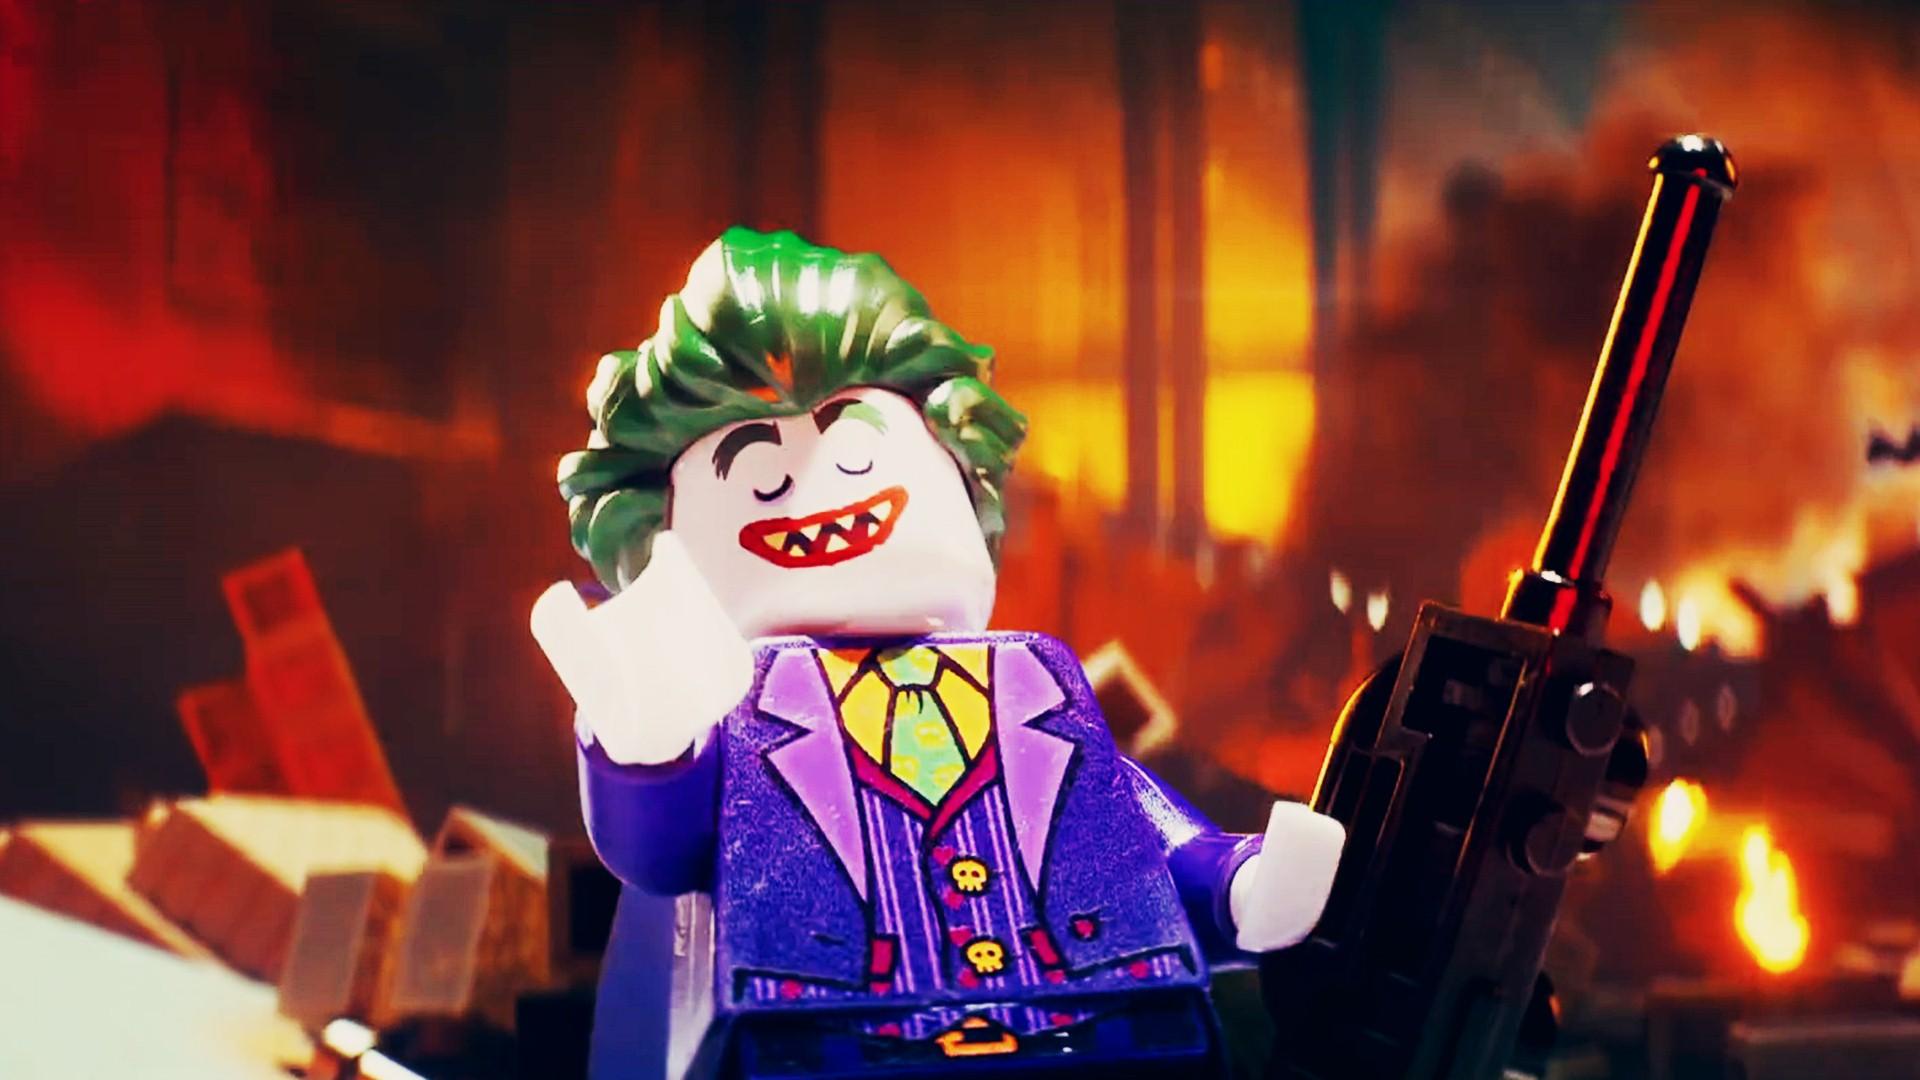 The Lego Batman Movie Wallpaper Hd Film Poster Image Free Hd 1920x1080